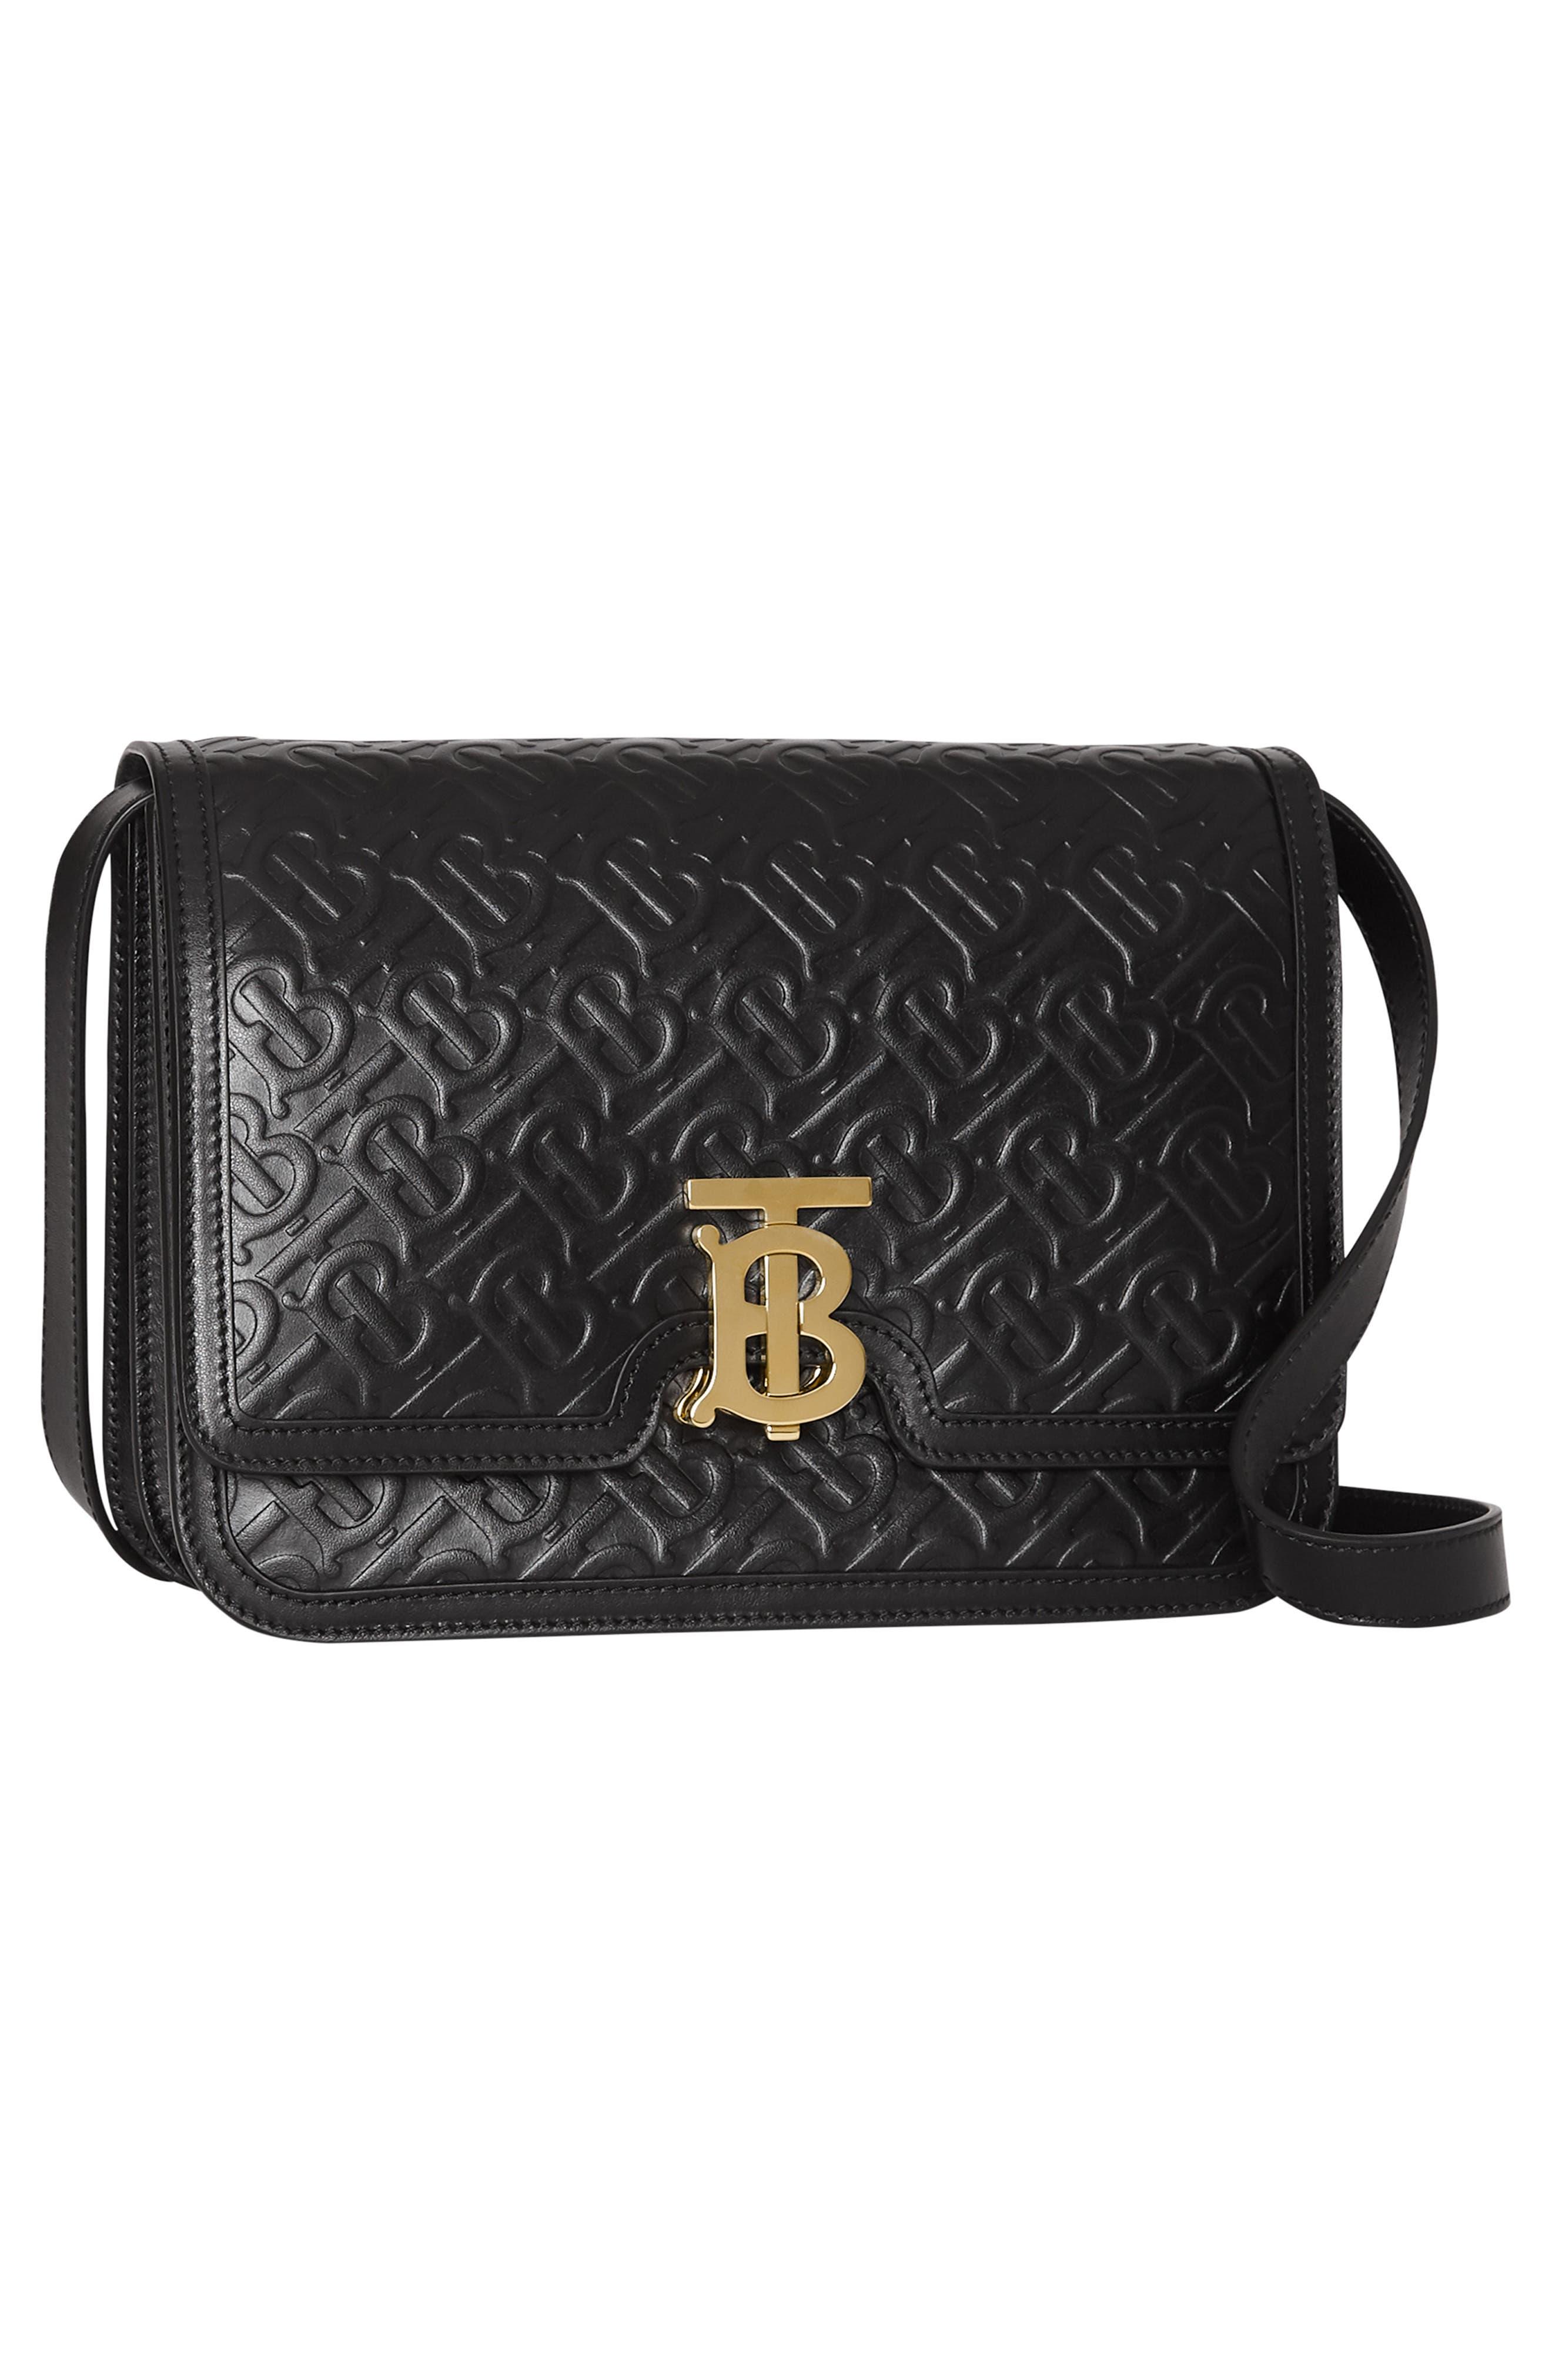 BURBERRY, Medium TB Monogram Leather Bag, Alternate thumbnail 9, color, BLACK